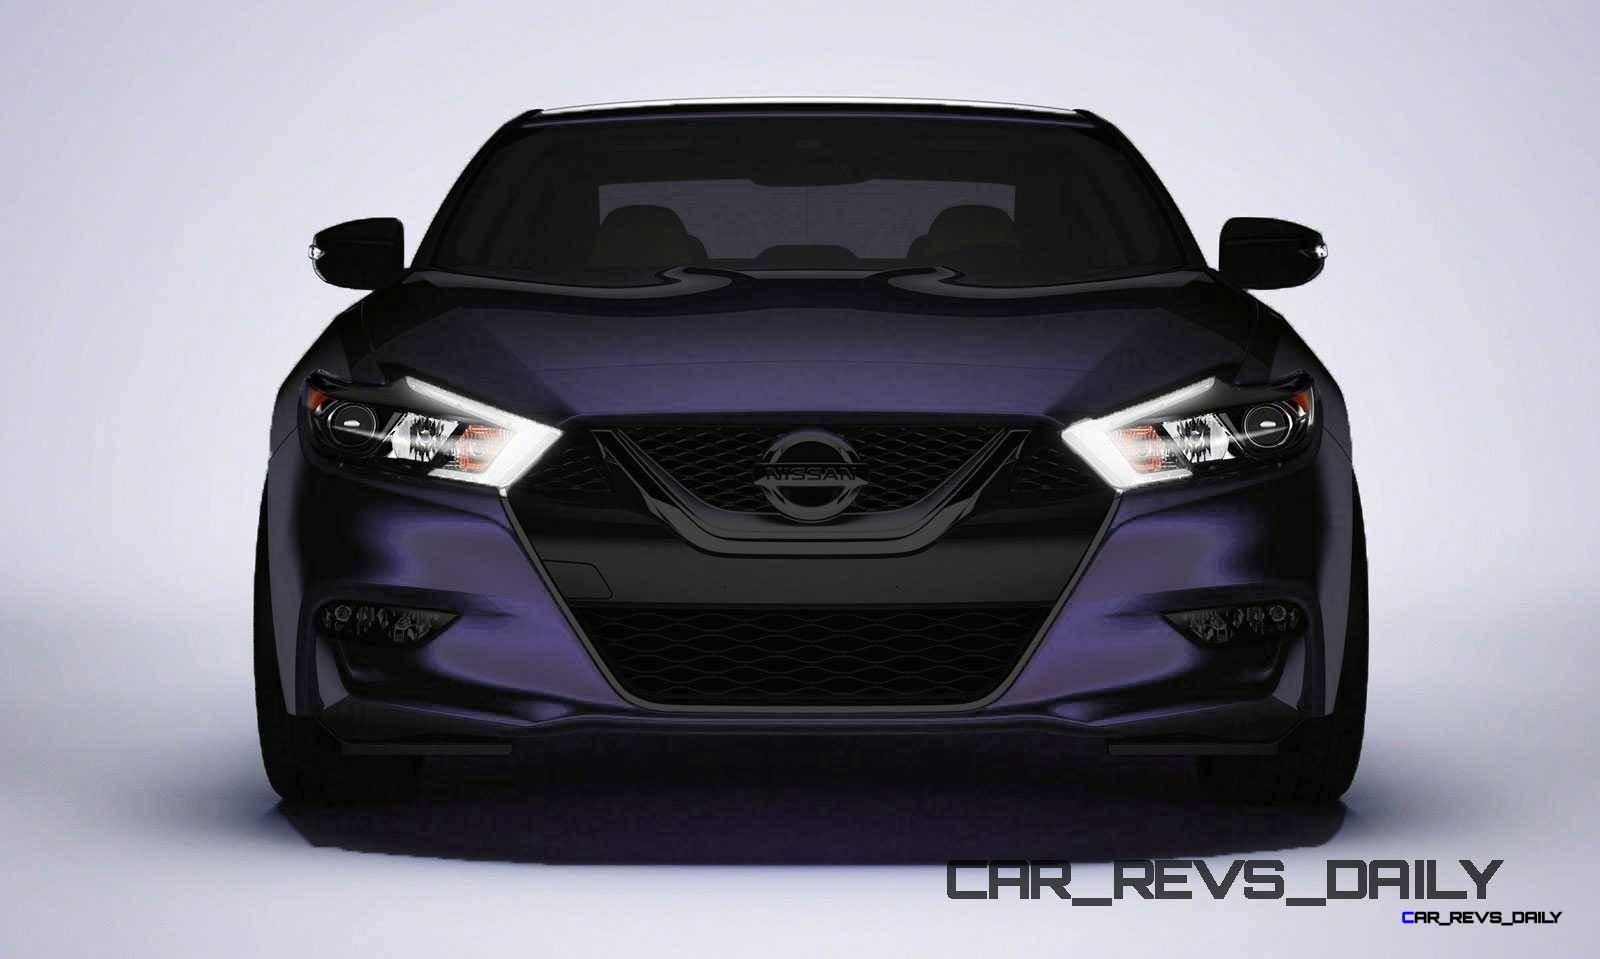 2016-Nissan-Maxima-SR-Deep-Pearl-Blue-11sd